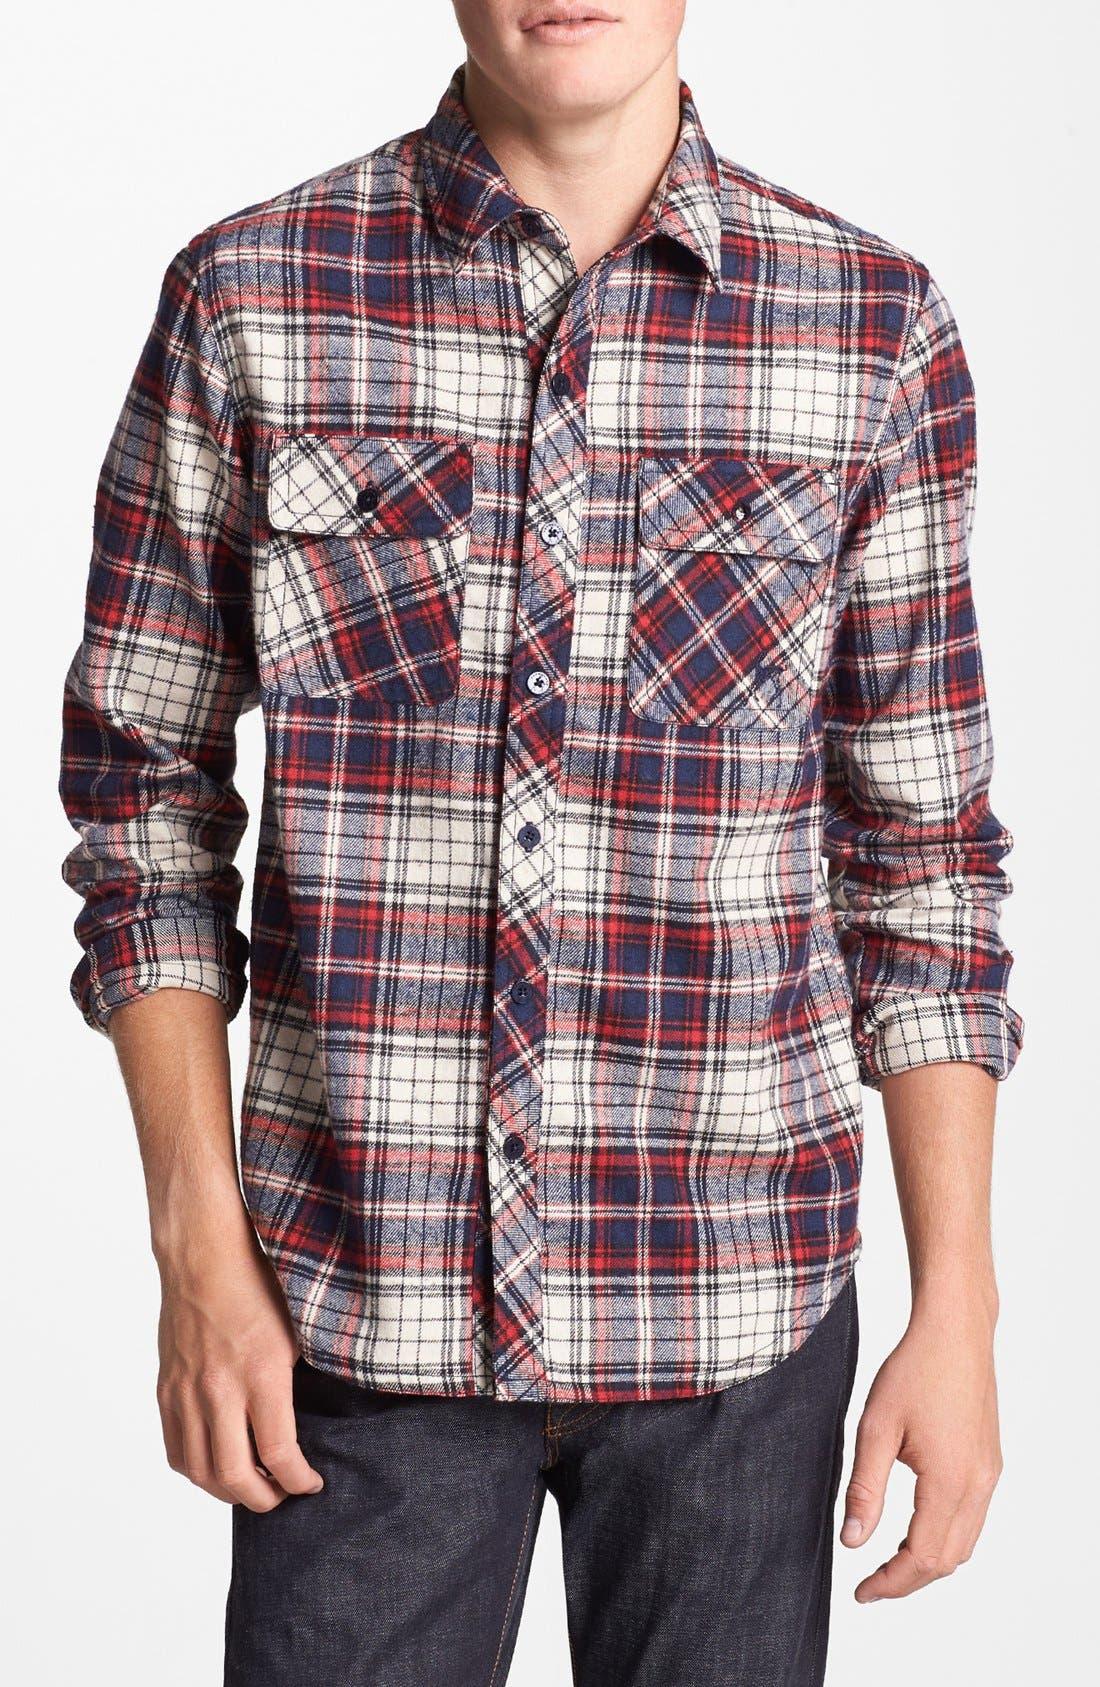 Main Image - Kane & Unke 'Darin's Fave' Plaid Flannel Shirt